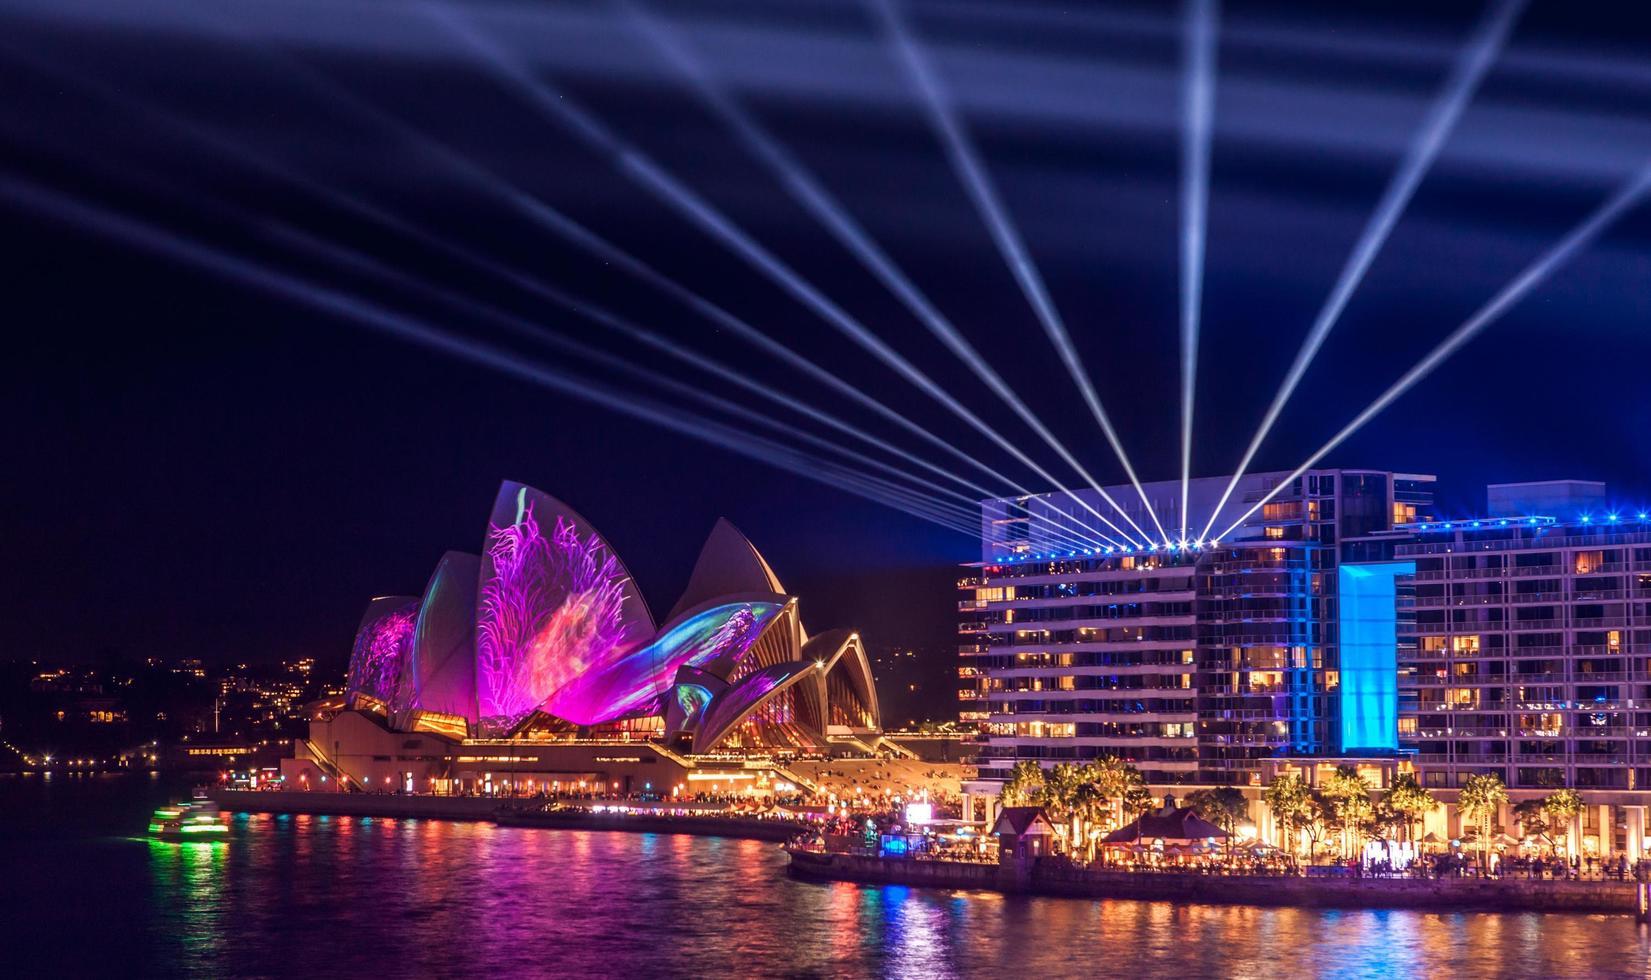 Sydney, Australia, 2020 - Sydney Opera House during nighttime photo